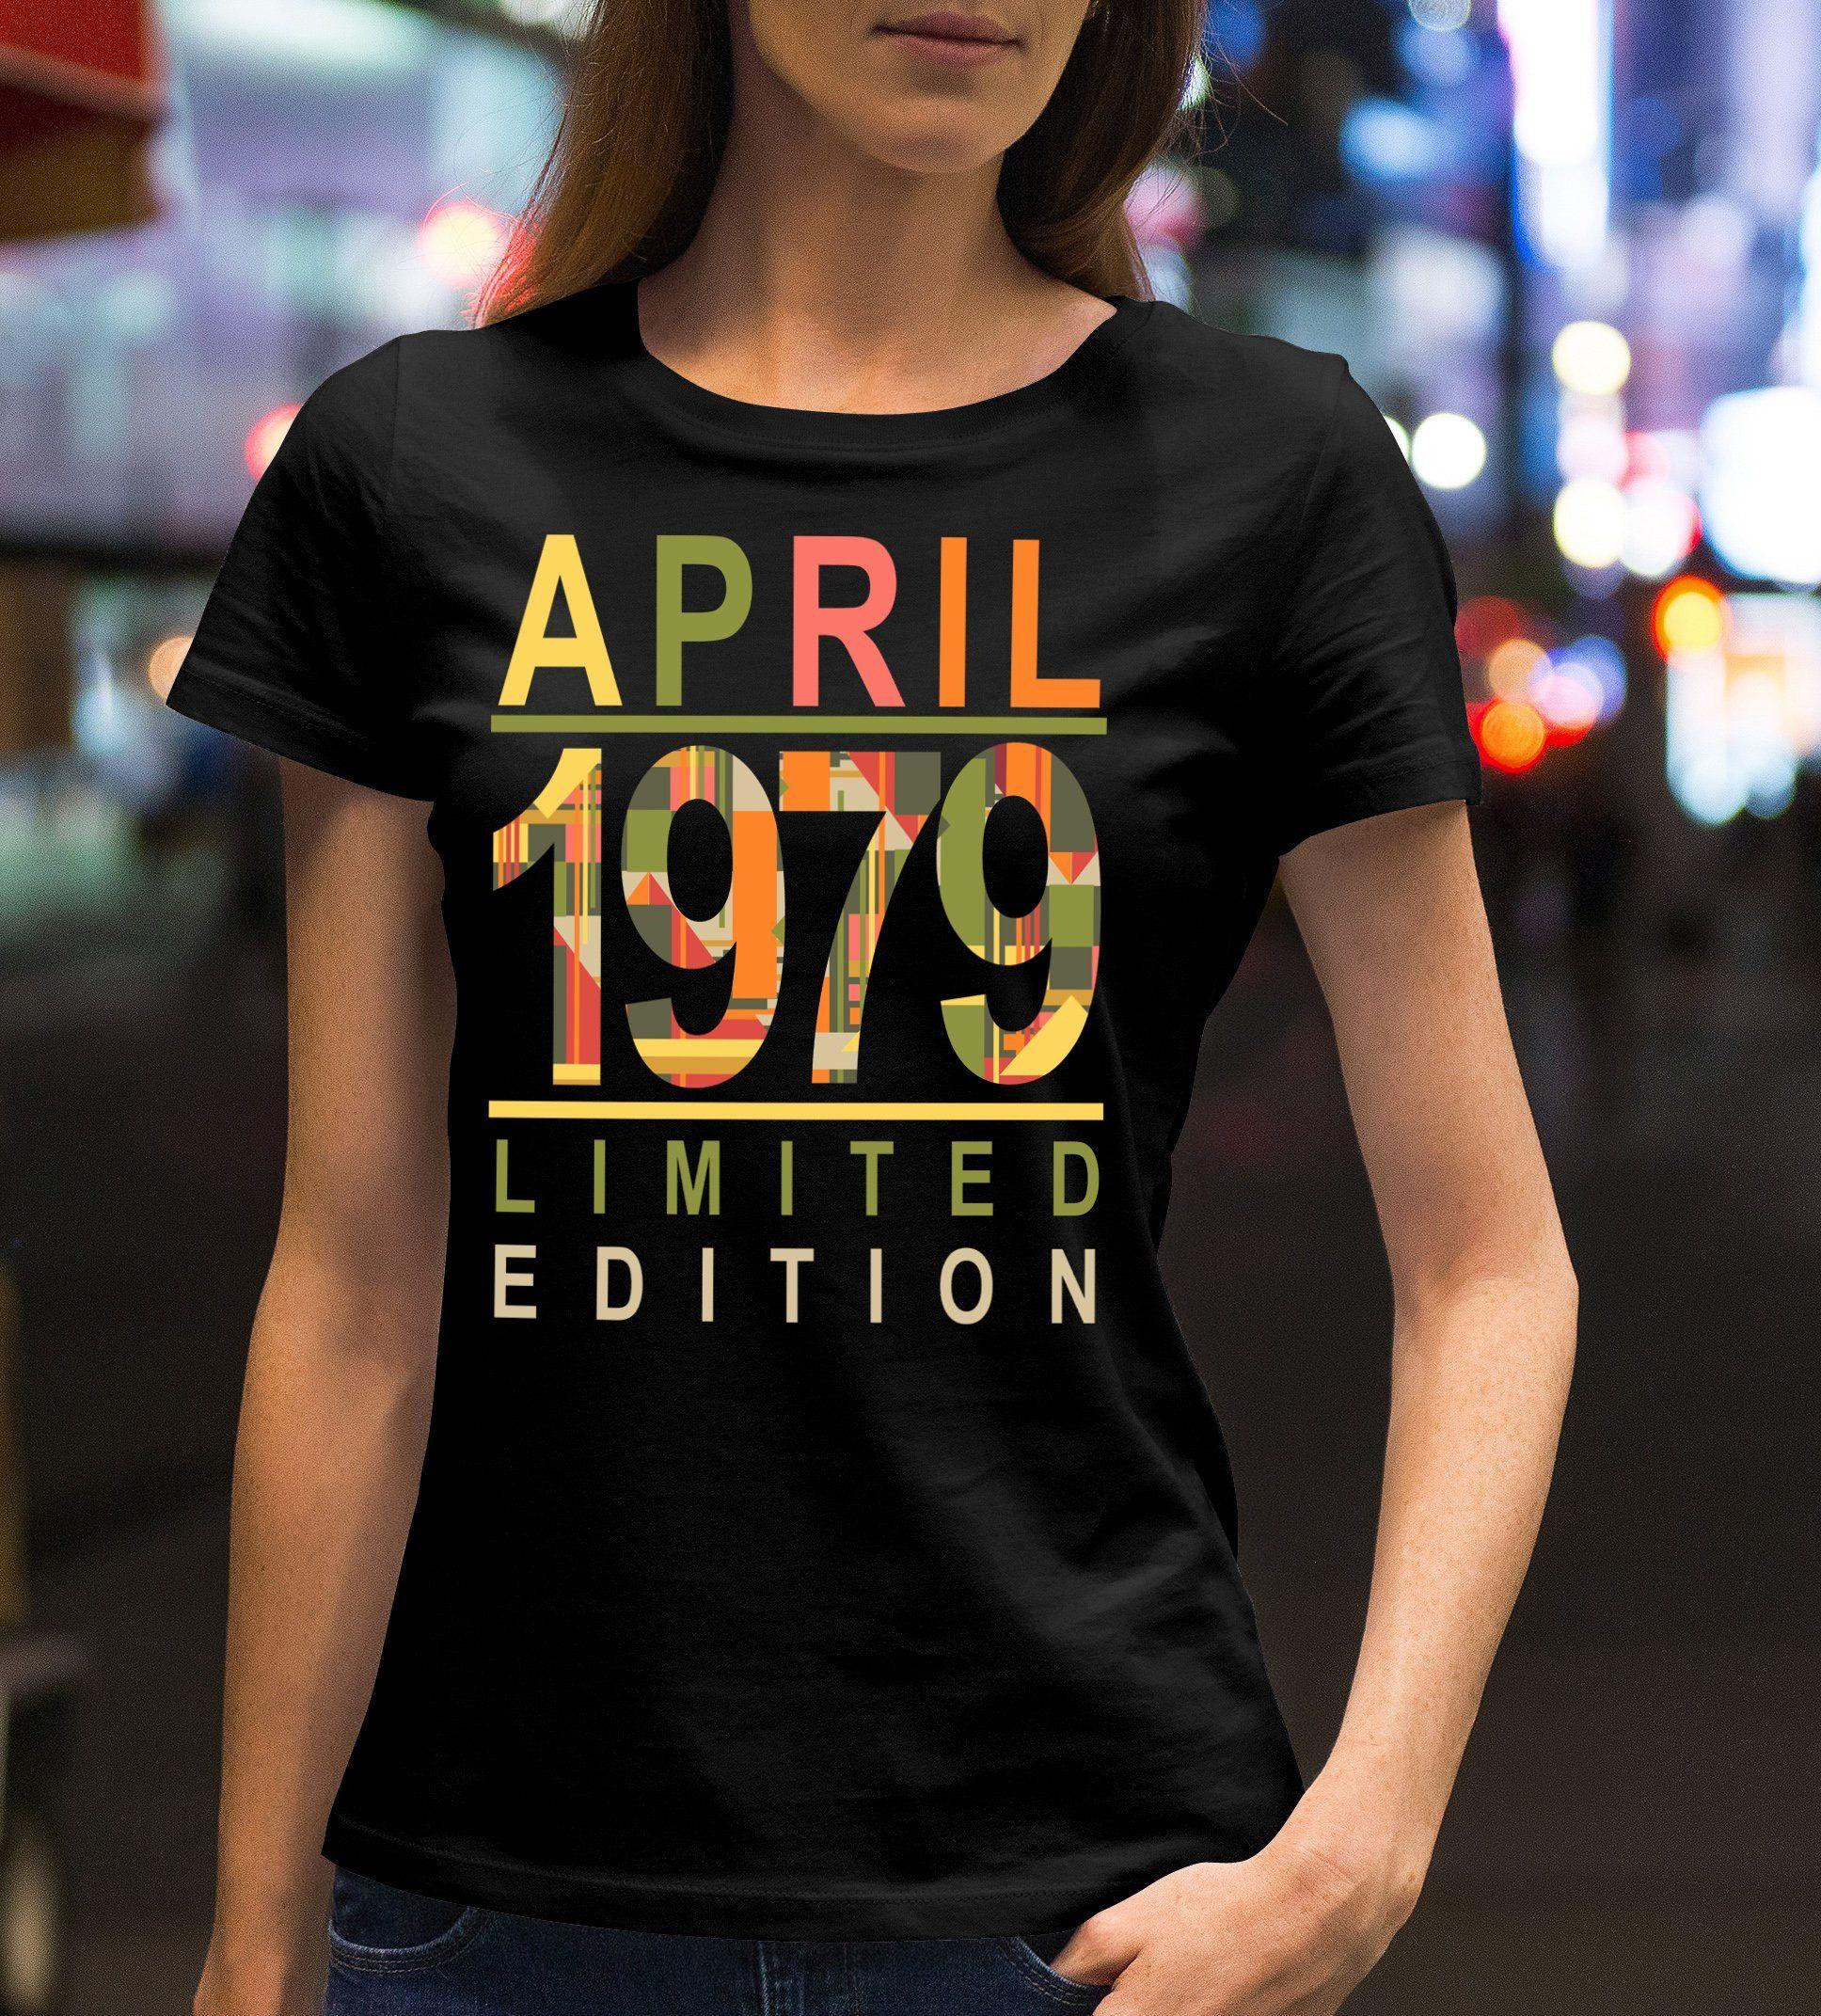 Birthday gift40thborn in 1979black tshirtwomens